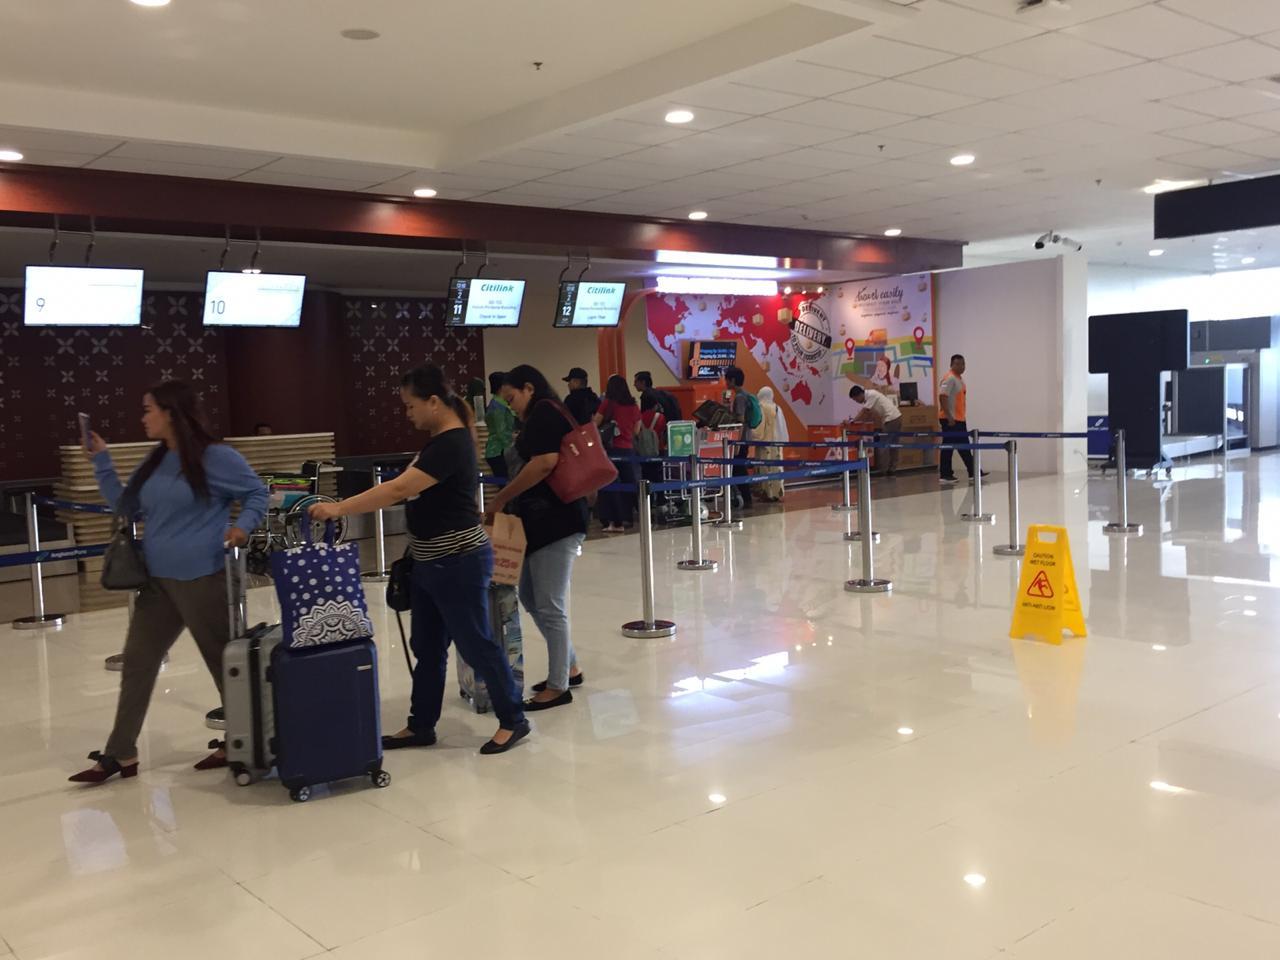 https: img.okezone.com content 2019 07 05 320 2075015 pembangunan-new-yogyakarta-international-airport-sudah-65-kapan-beroperasinya-IGx5UVnHVP.jpg